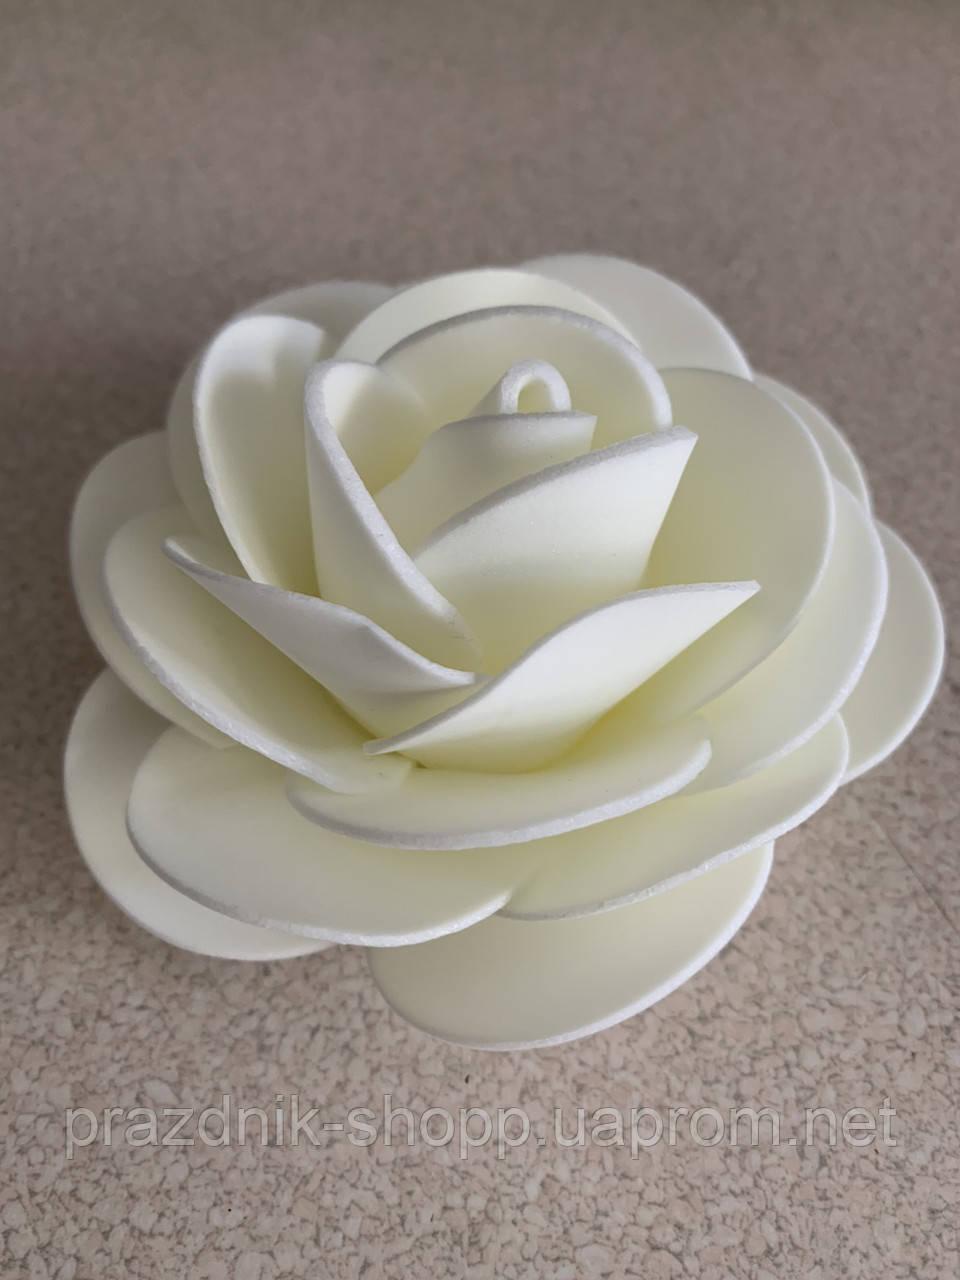 Роза белая, фоамиран.